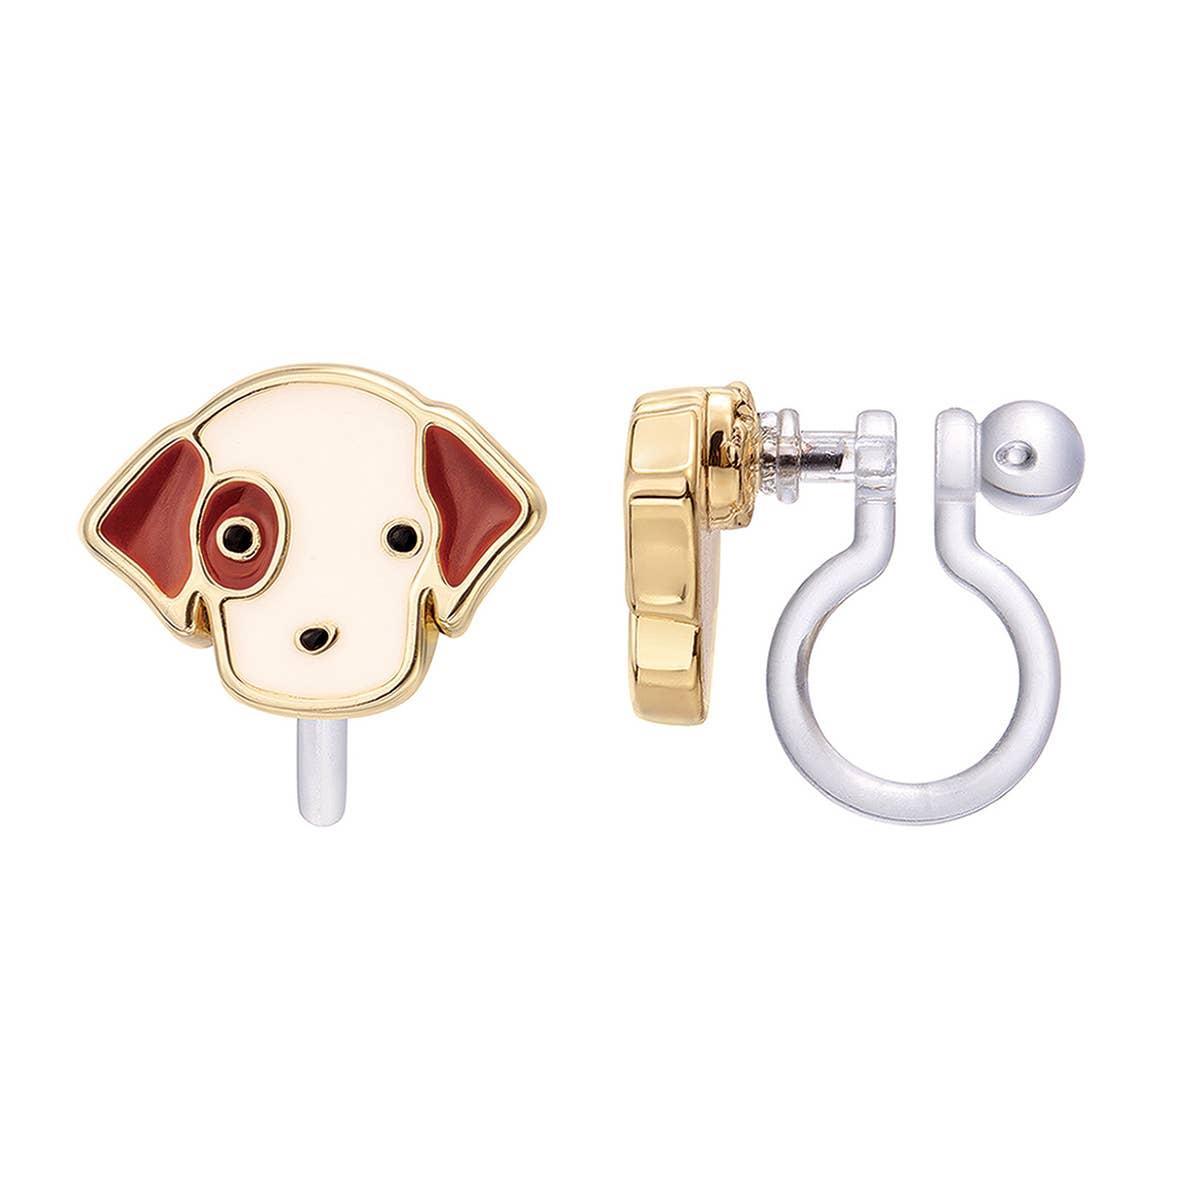 CLIP ON Cutie Earrings- Perky Puppy | Trada Marketplace